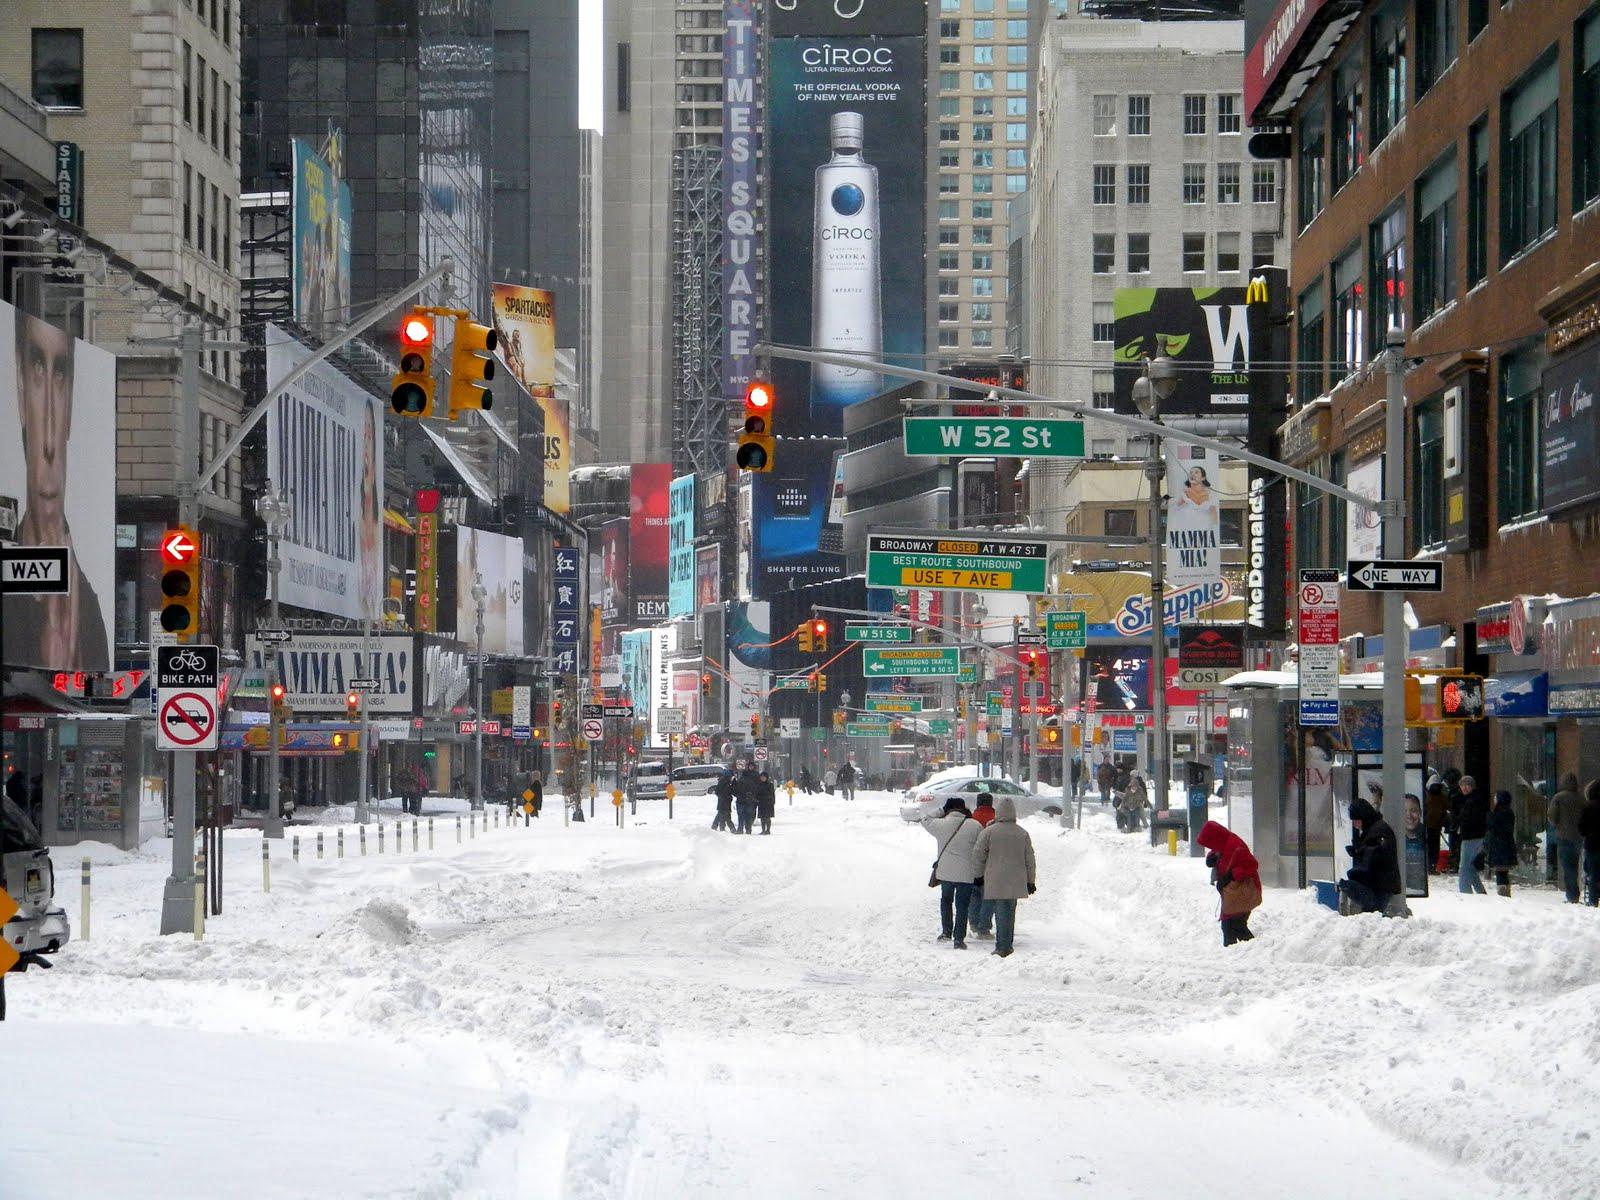 Winter Desktop Wallpaper Winter Desktop Wallpaper New York City 1600x1200